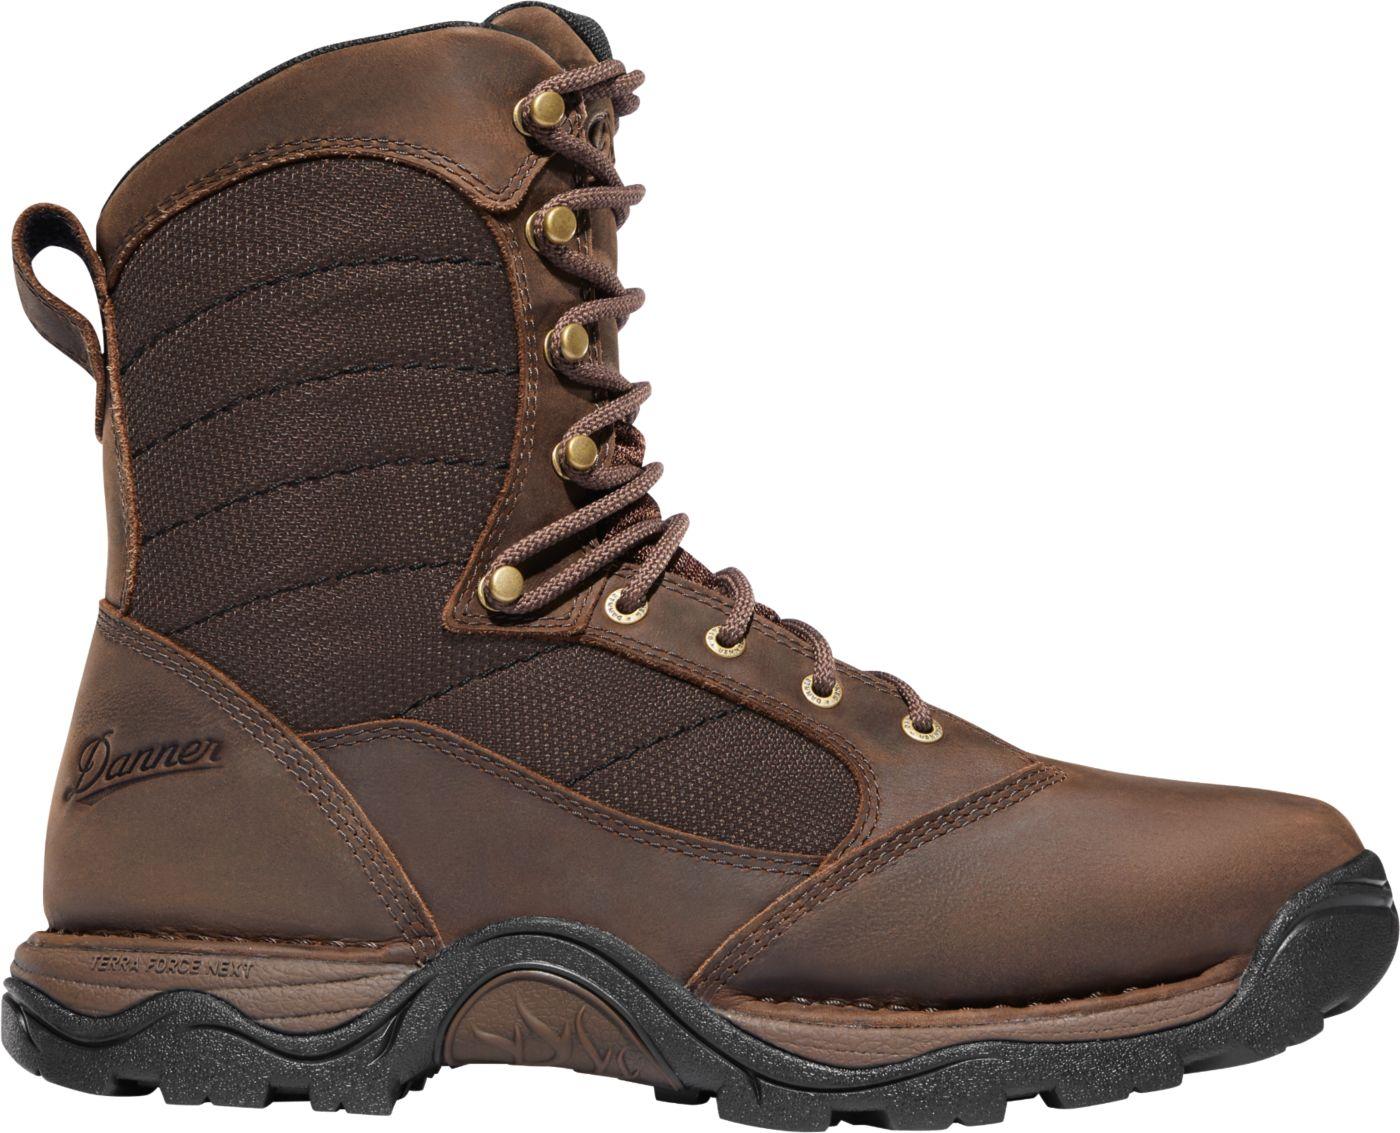 "Danner Men's Pronghorn 8"" Waterproof Hunting Boots"